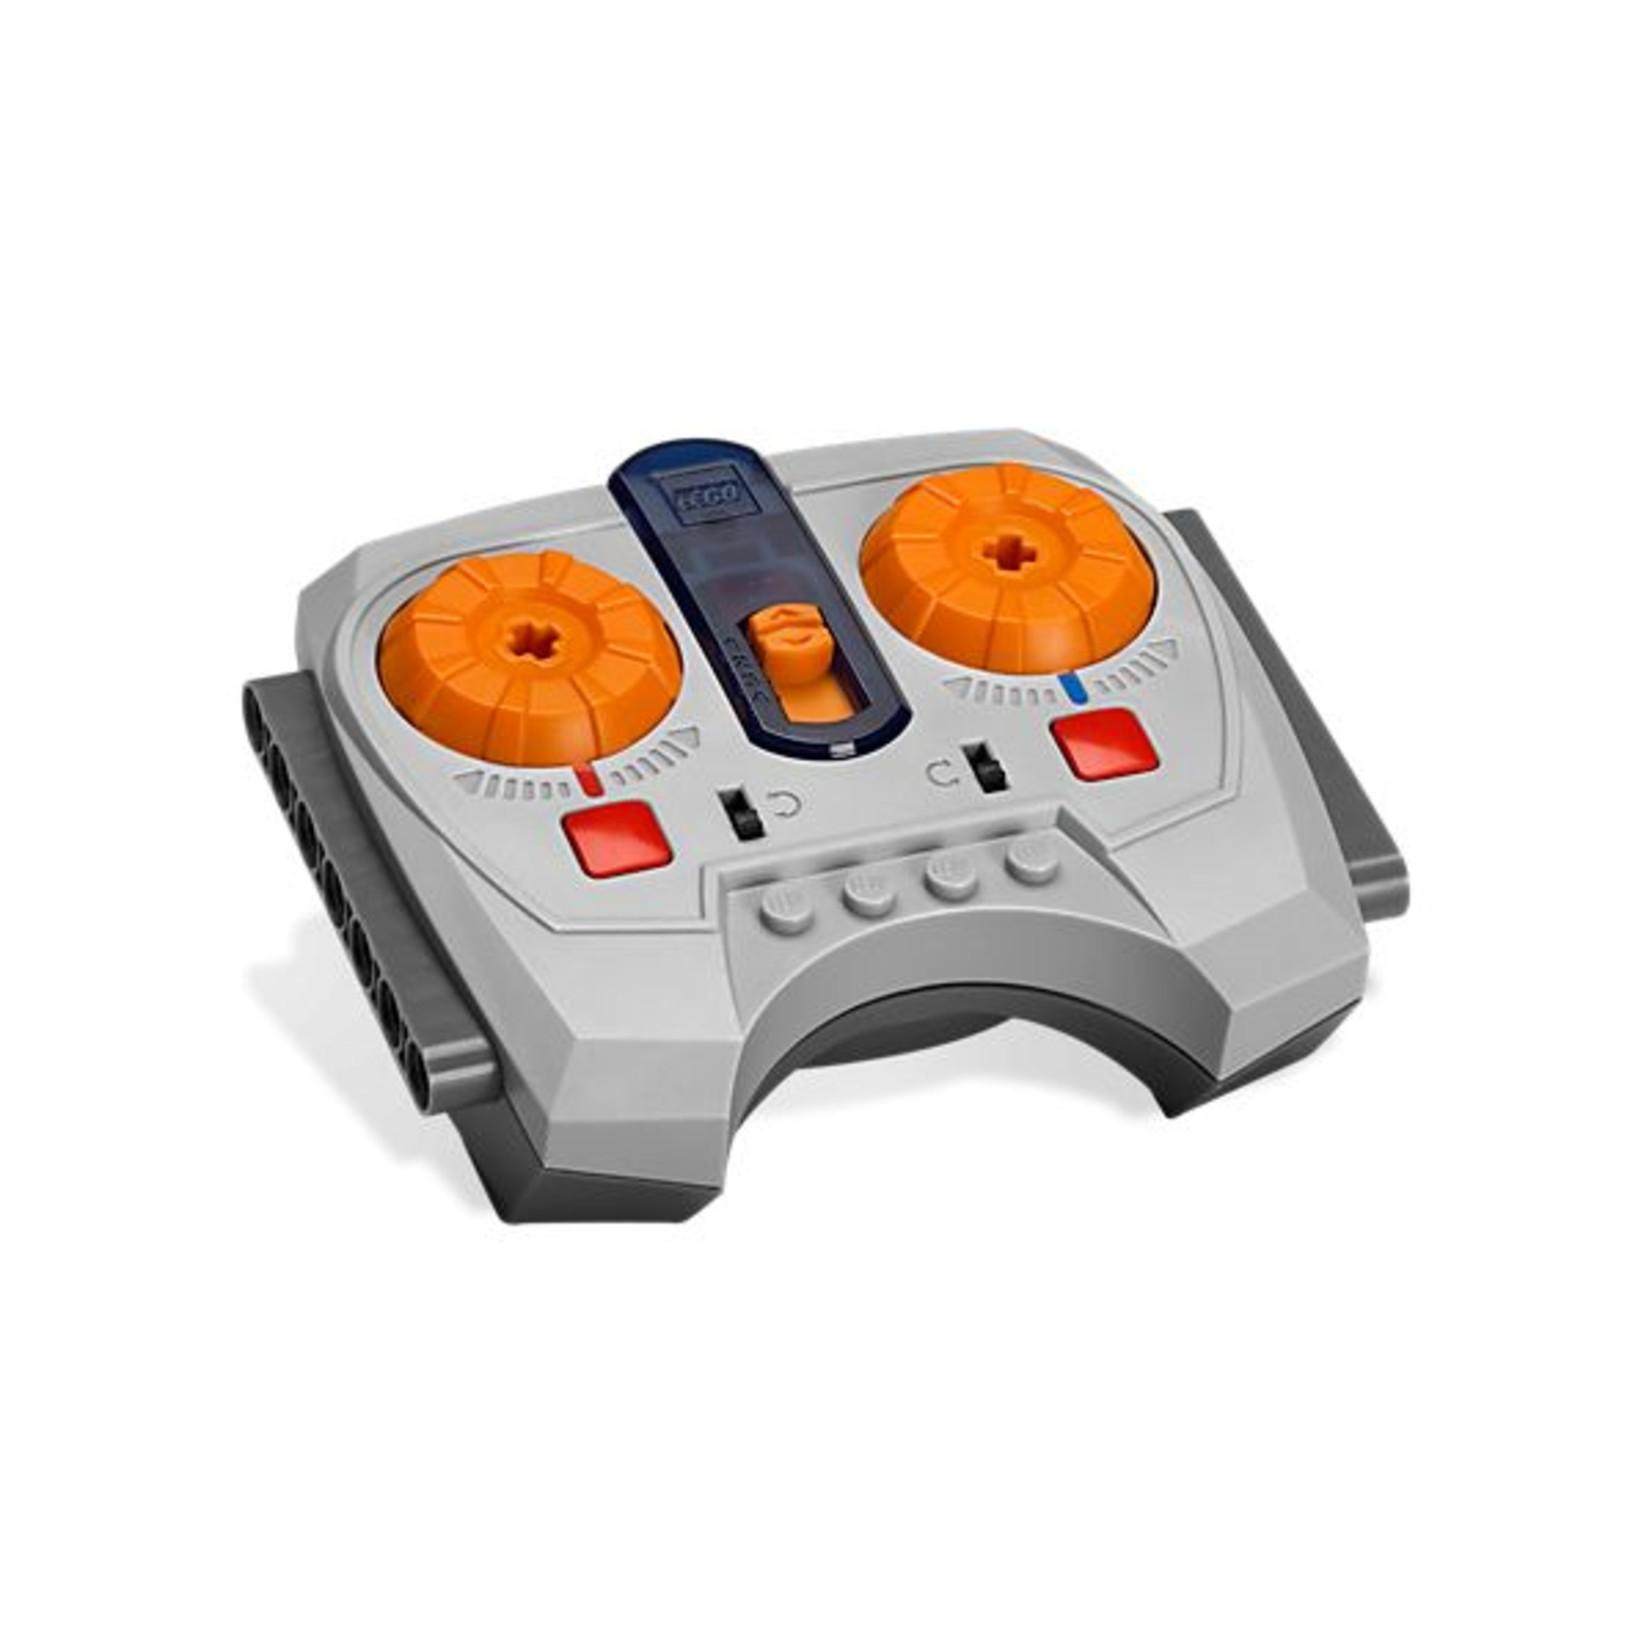 LEGO® Education IR Speed Remote Control (8879)